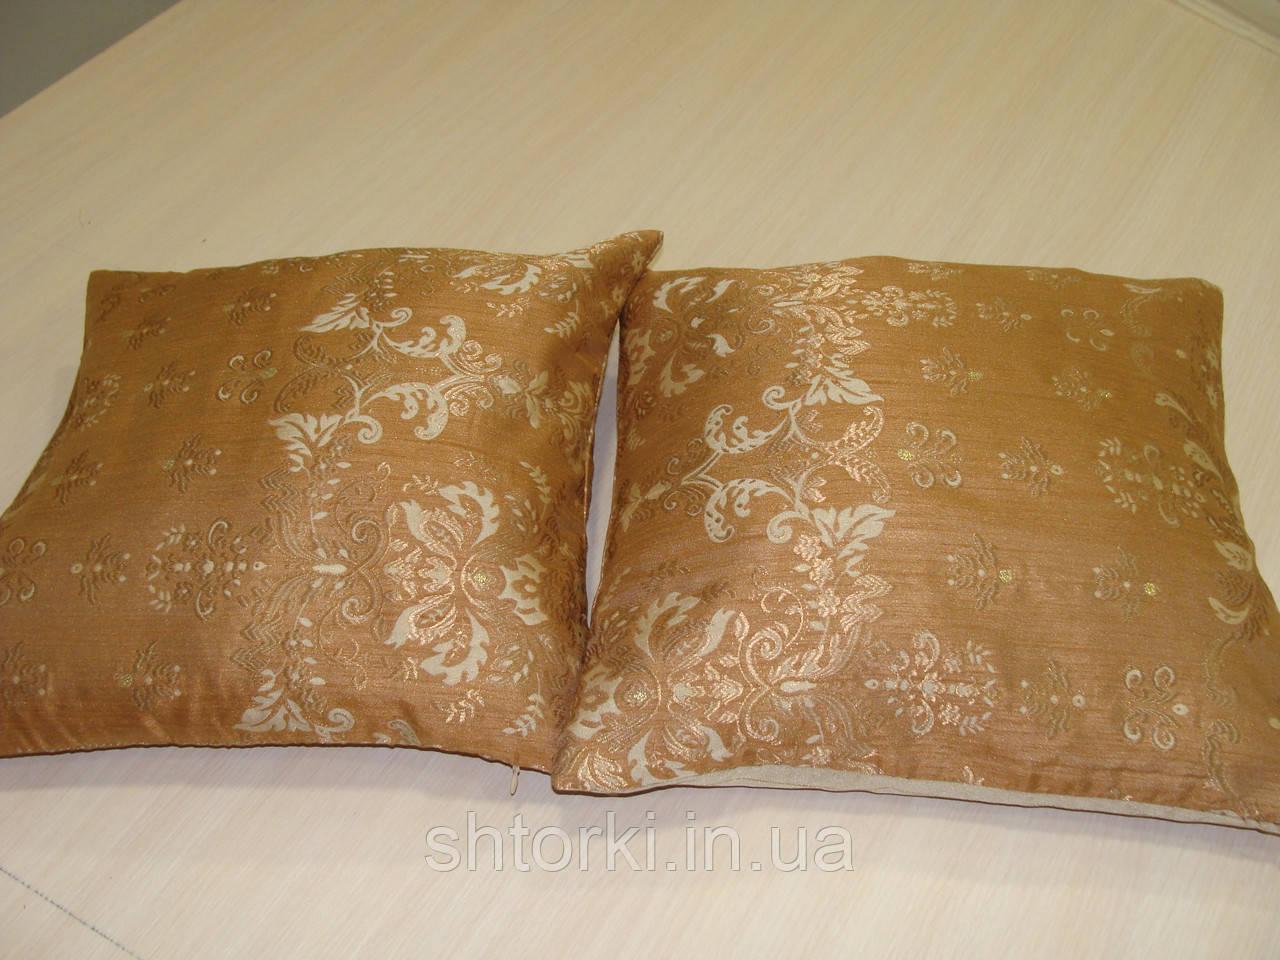 Комплект подушек Арда  светло коричневые , 2 шт